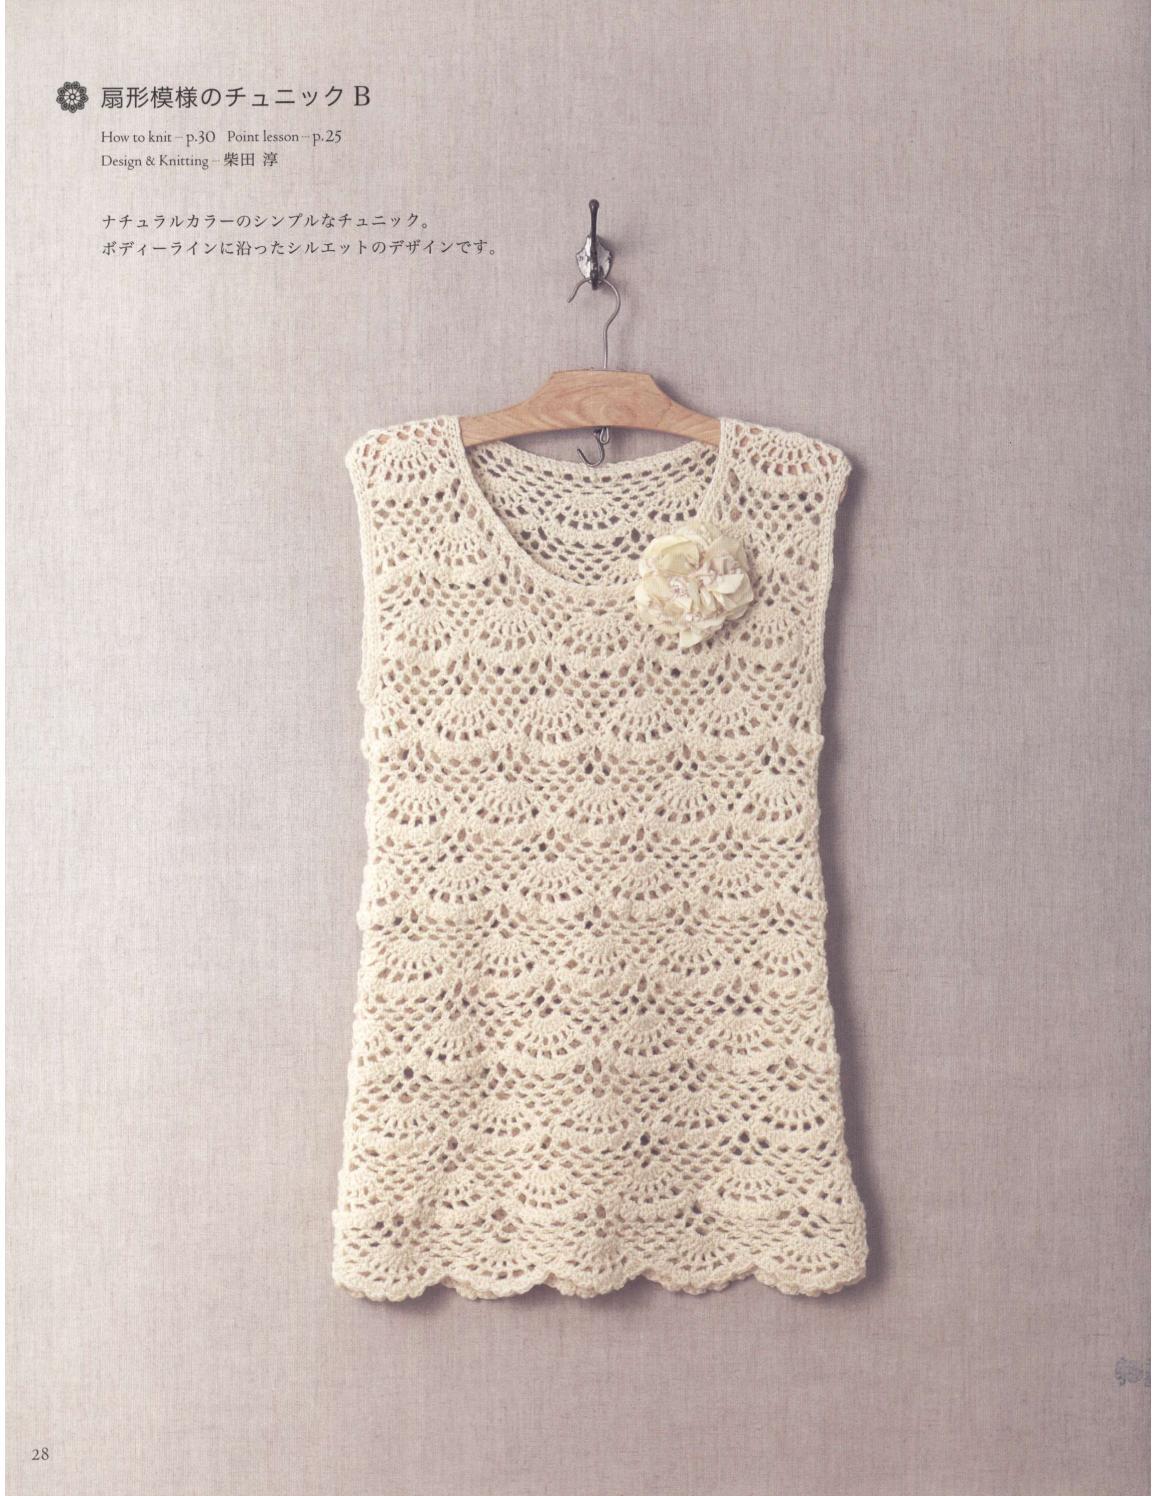 Asahi original crochet best selection 2012 page 28